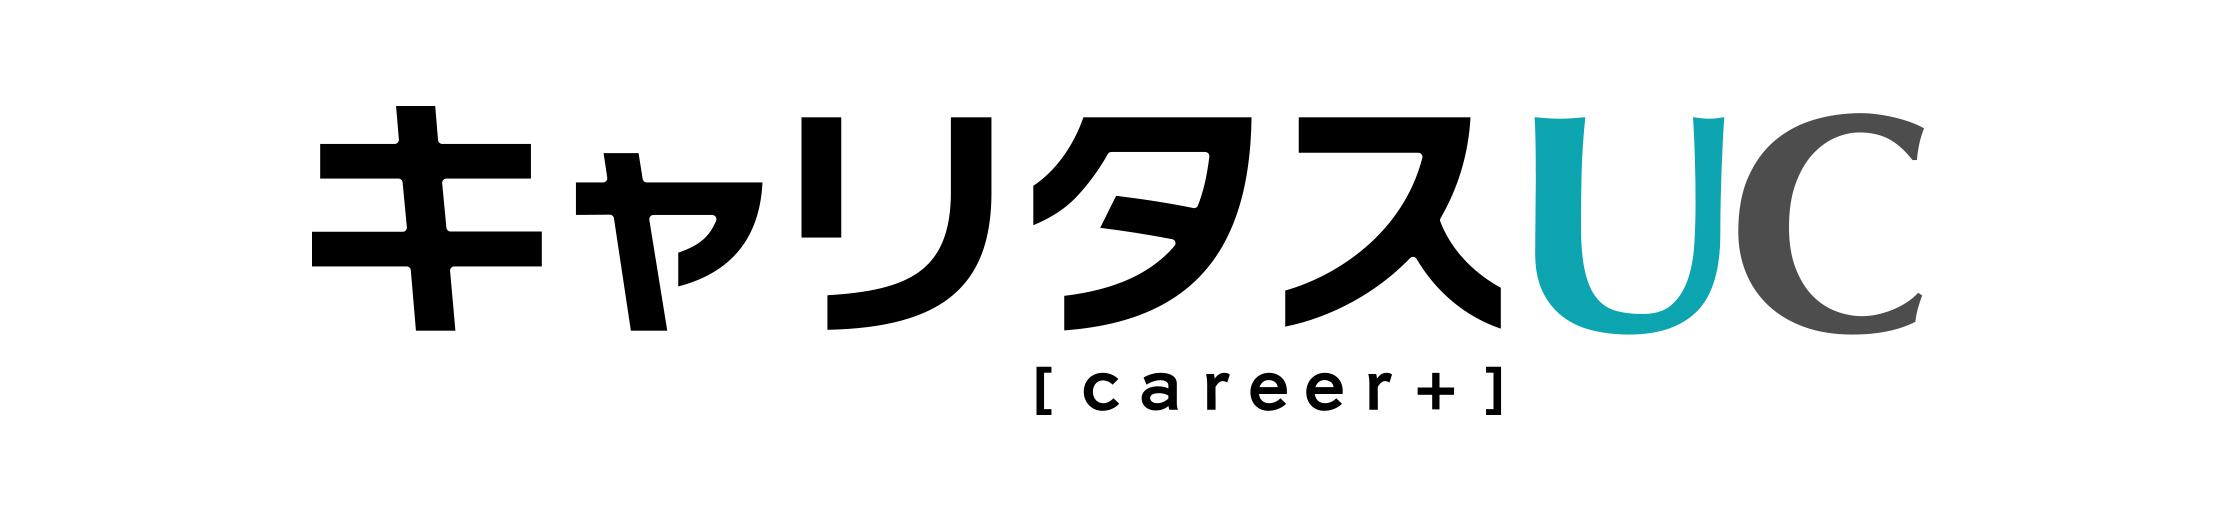 RGB_UC_logo.jpg